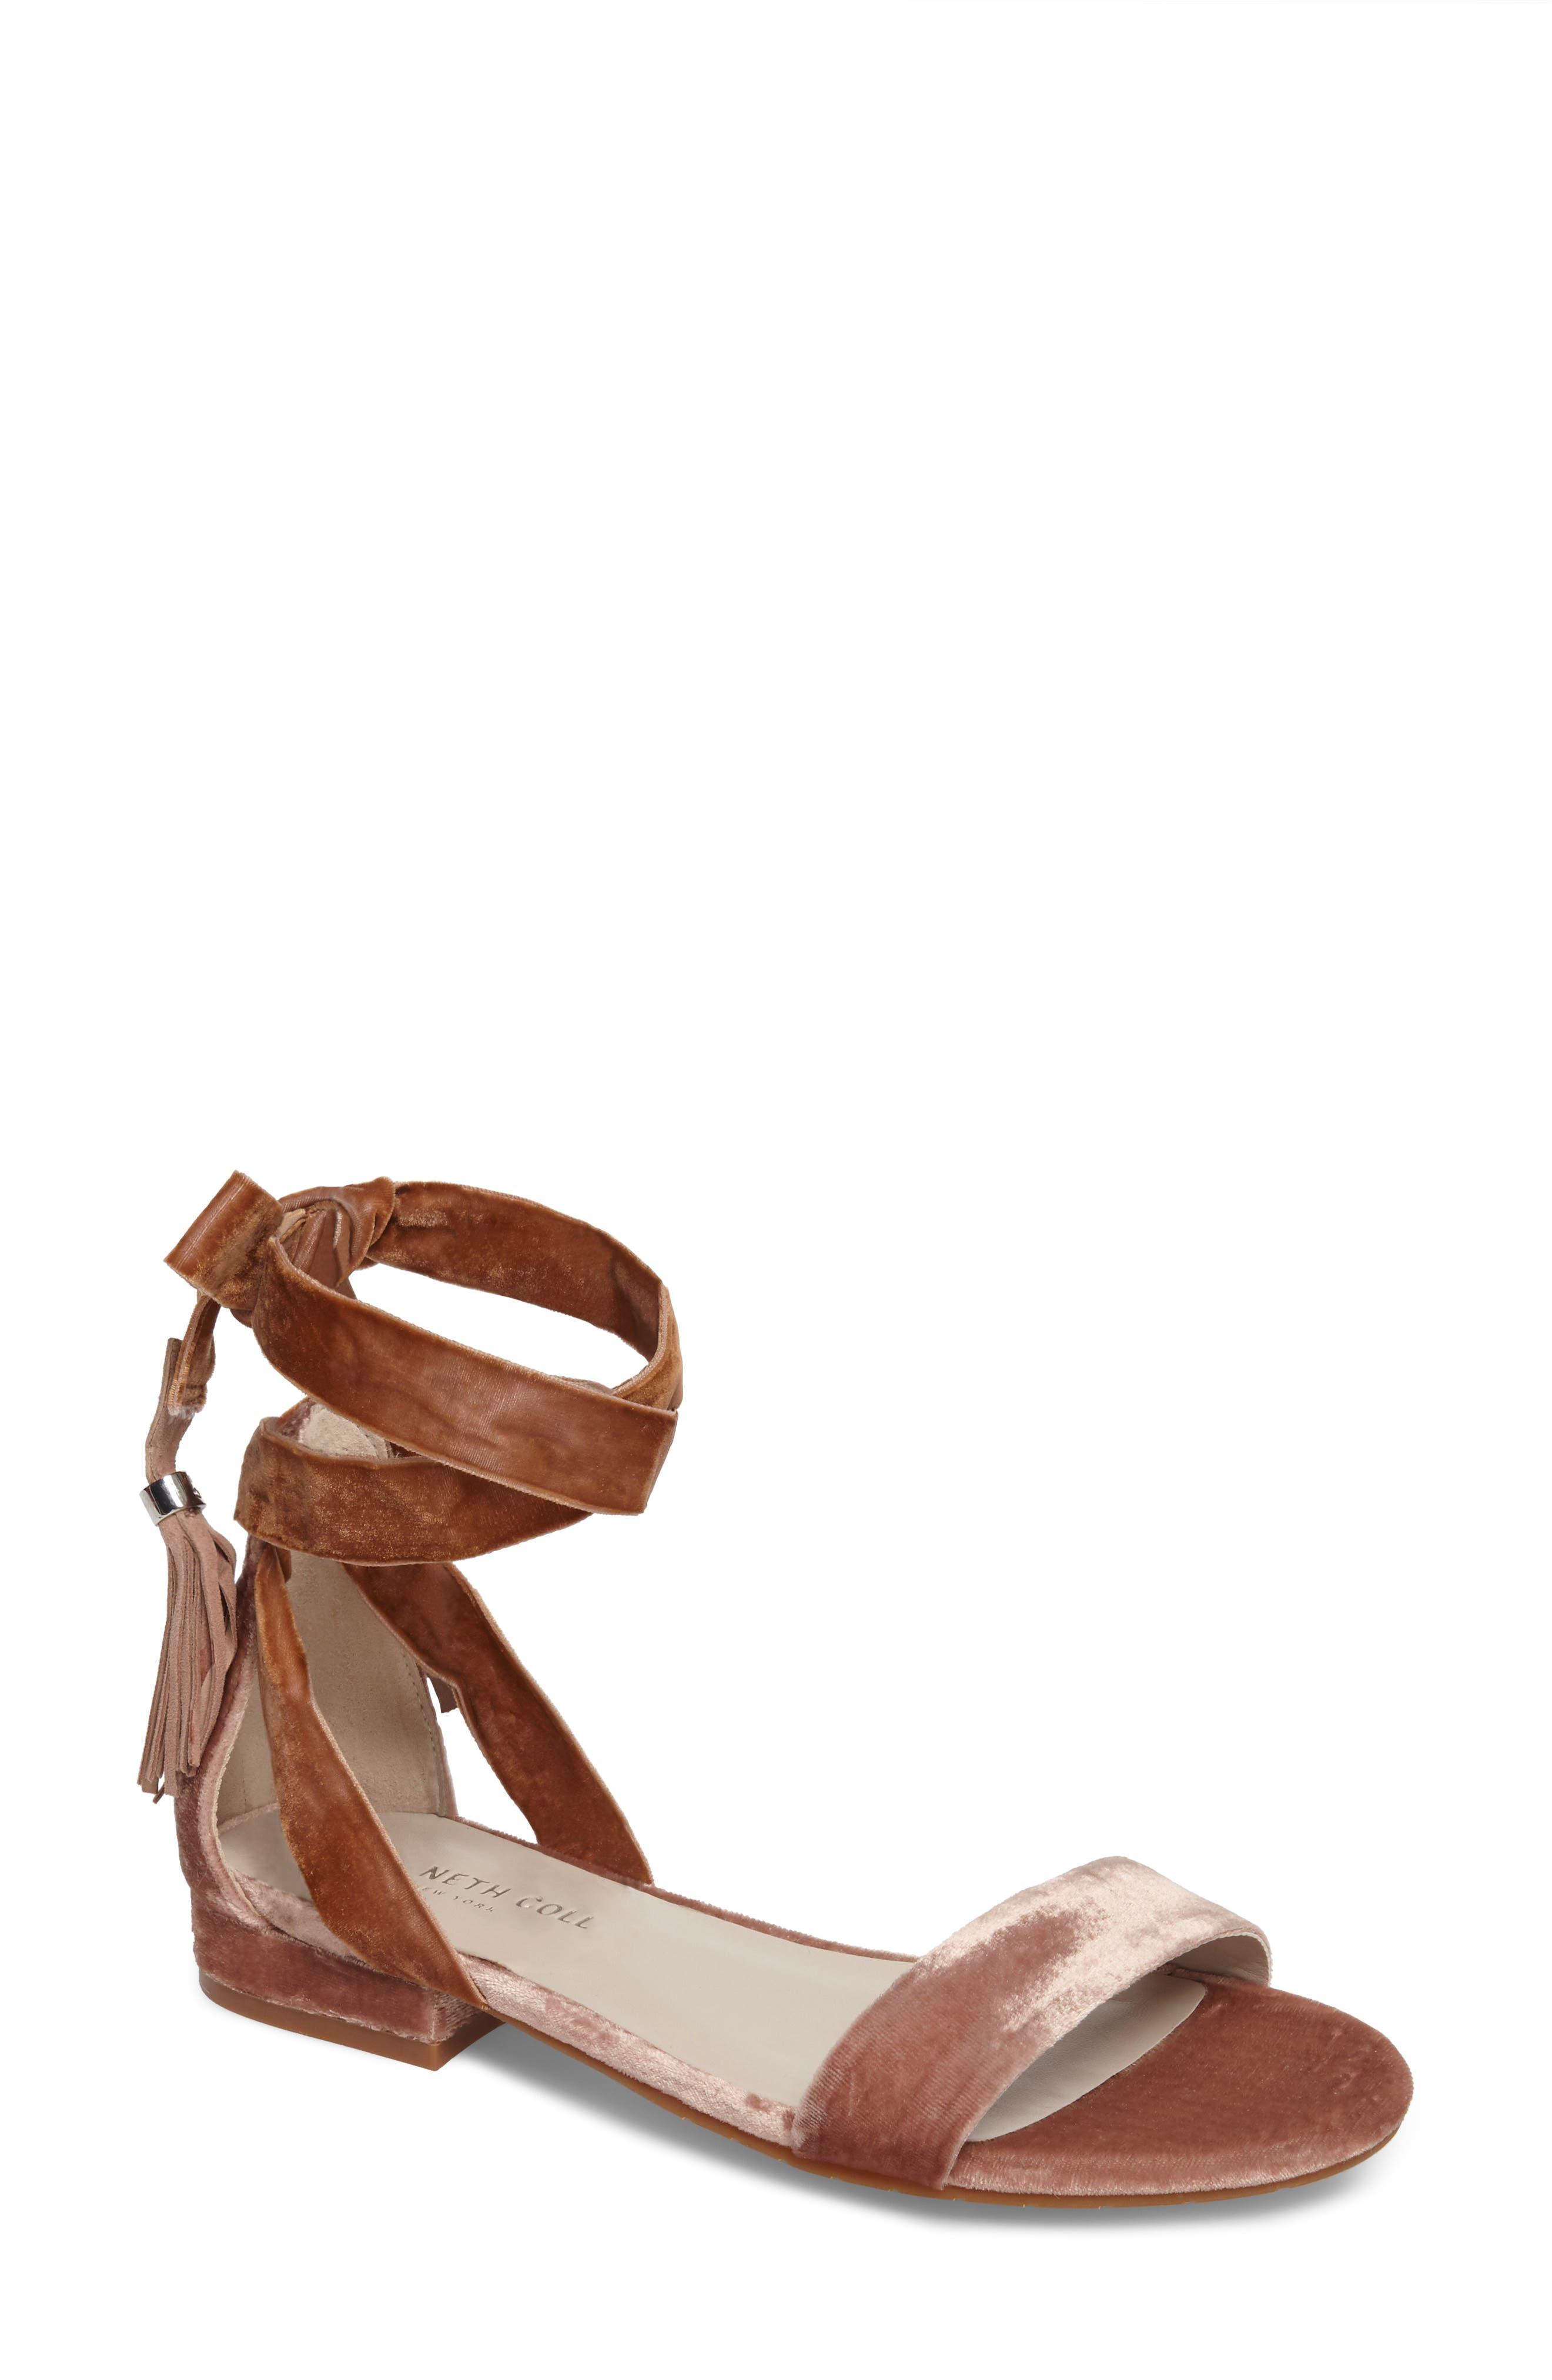 Valen Tassel Lace-Up Sandal,                             Main thumbnail 1, color,                             Blush Velvet